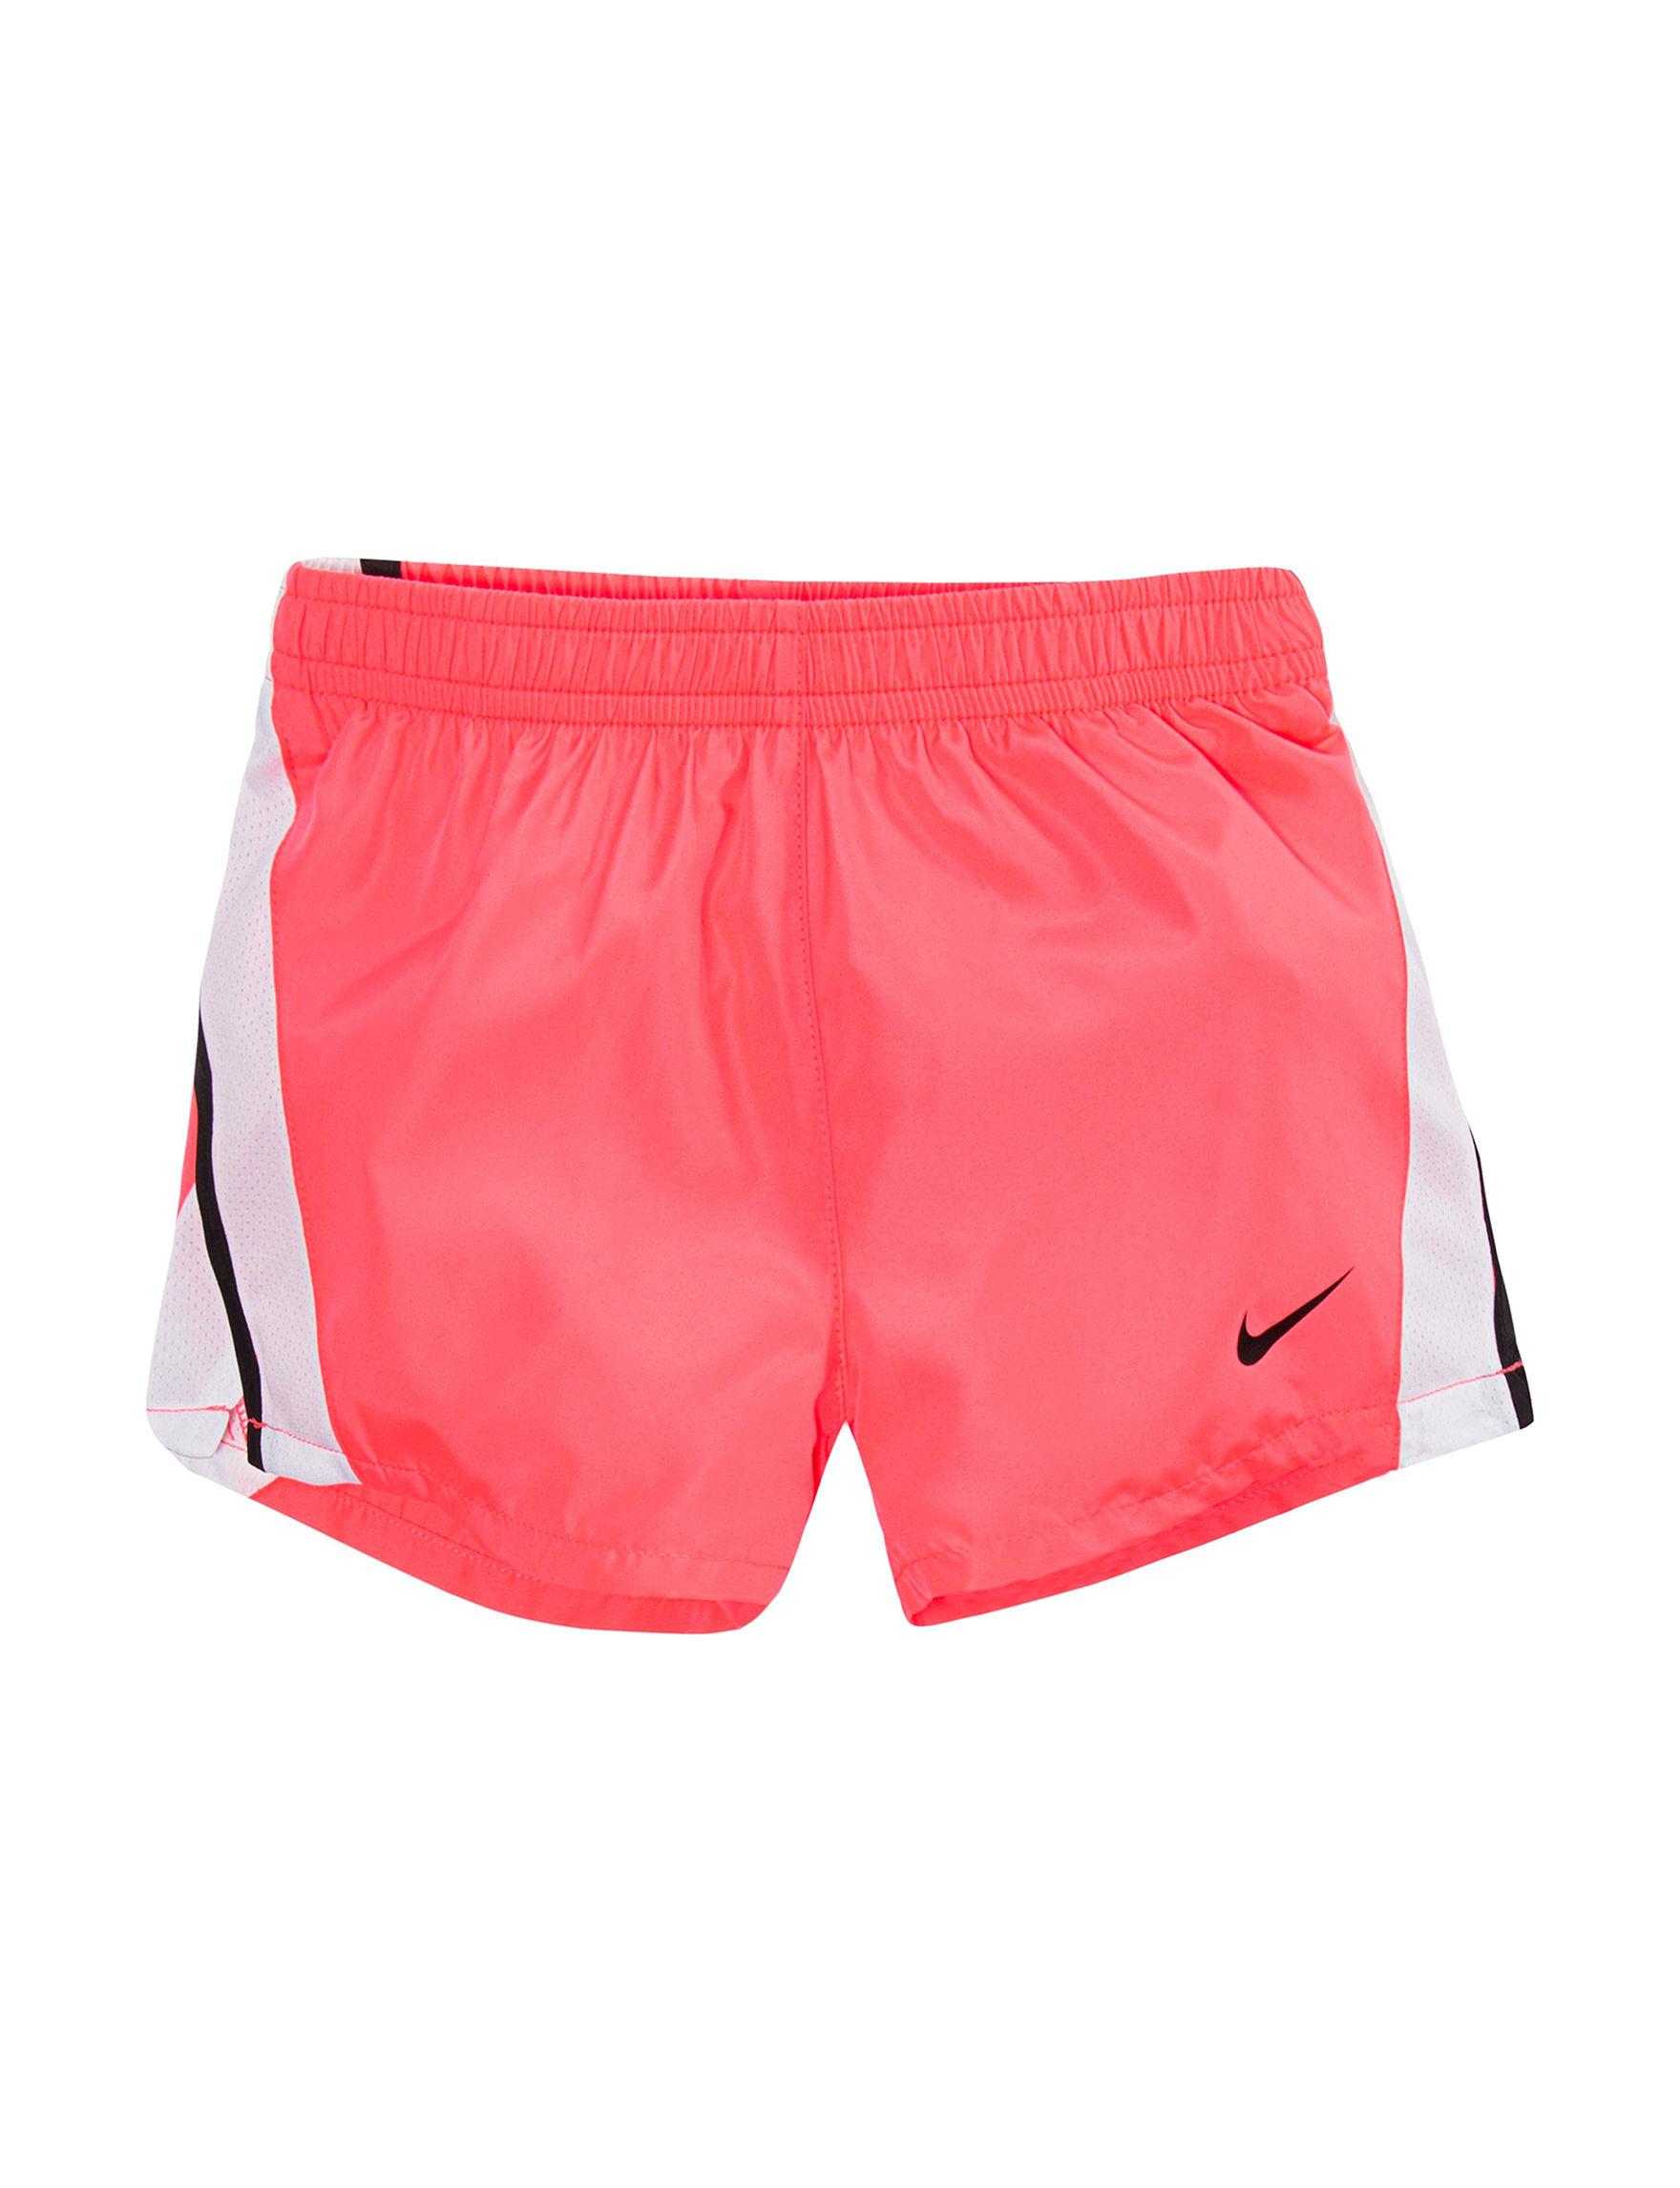 Nike Pink Soft Shorts